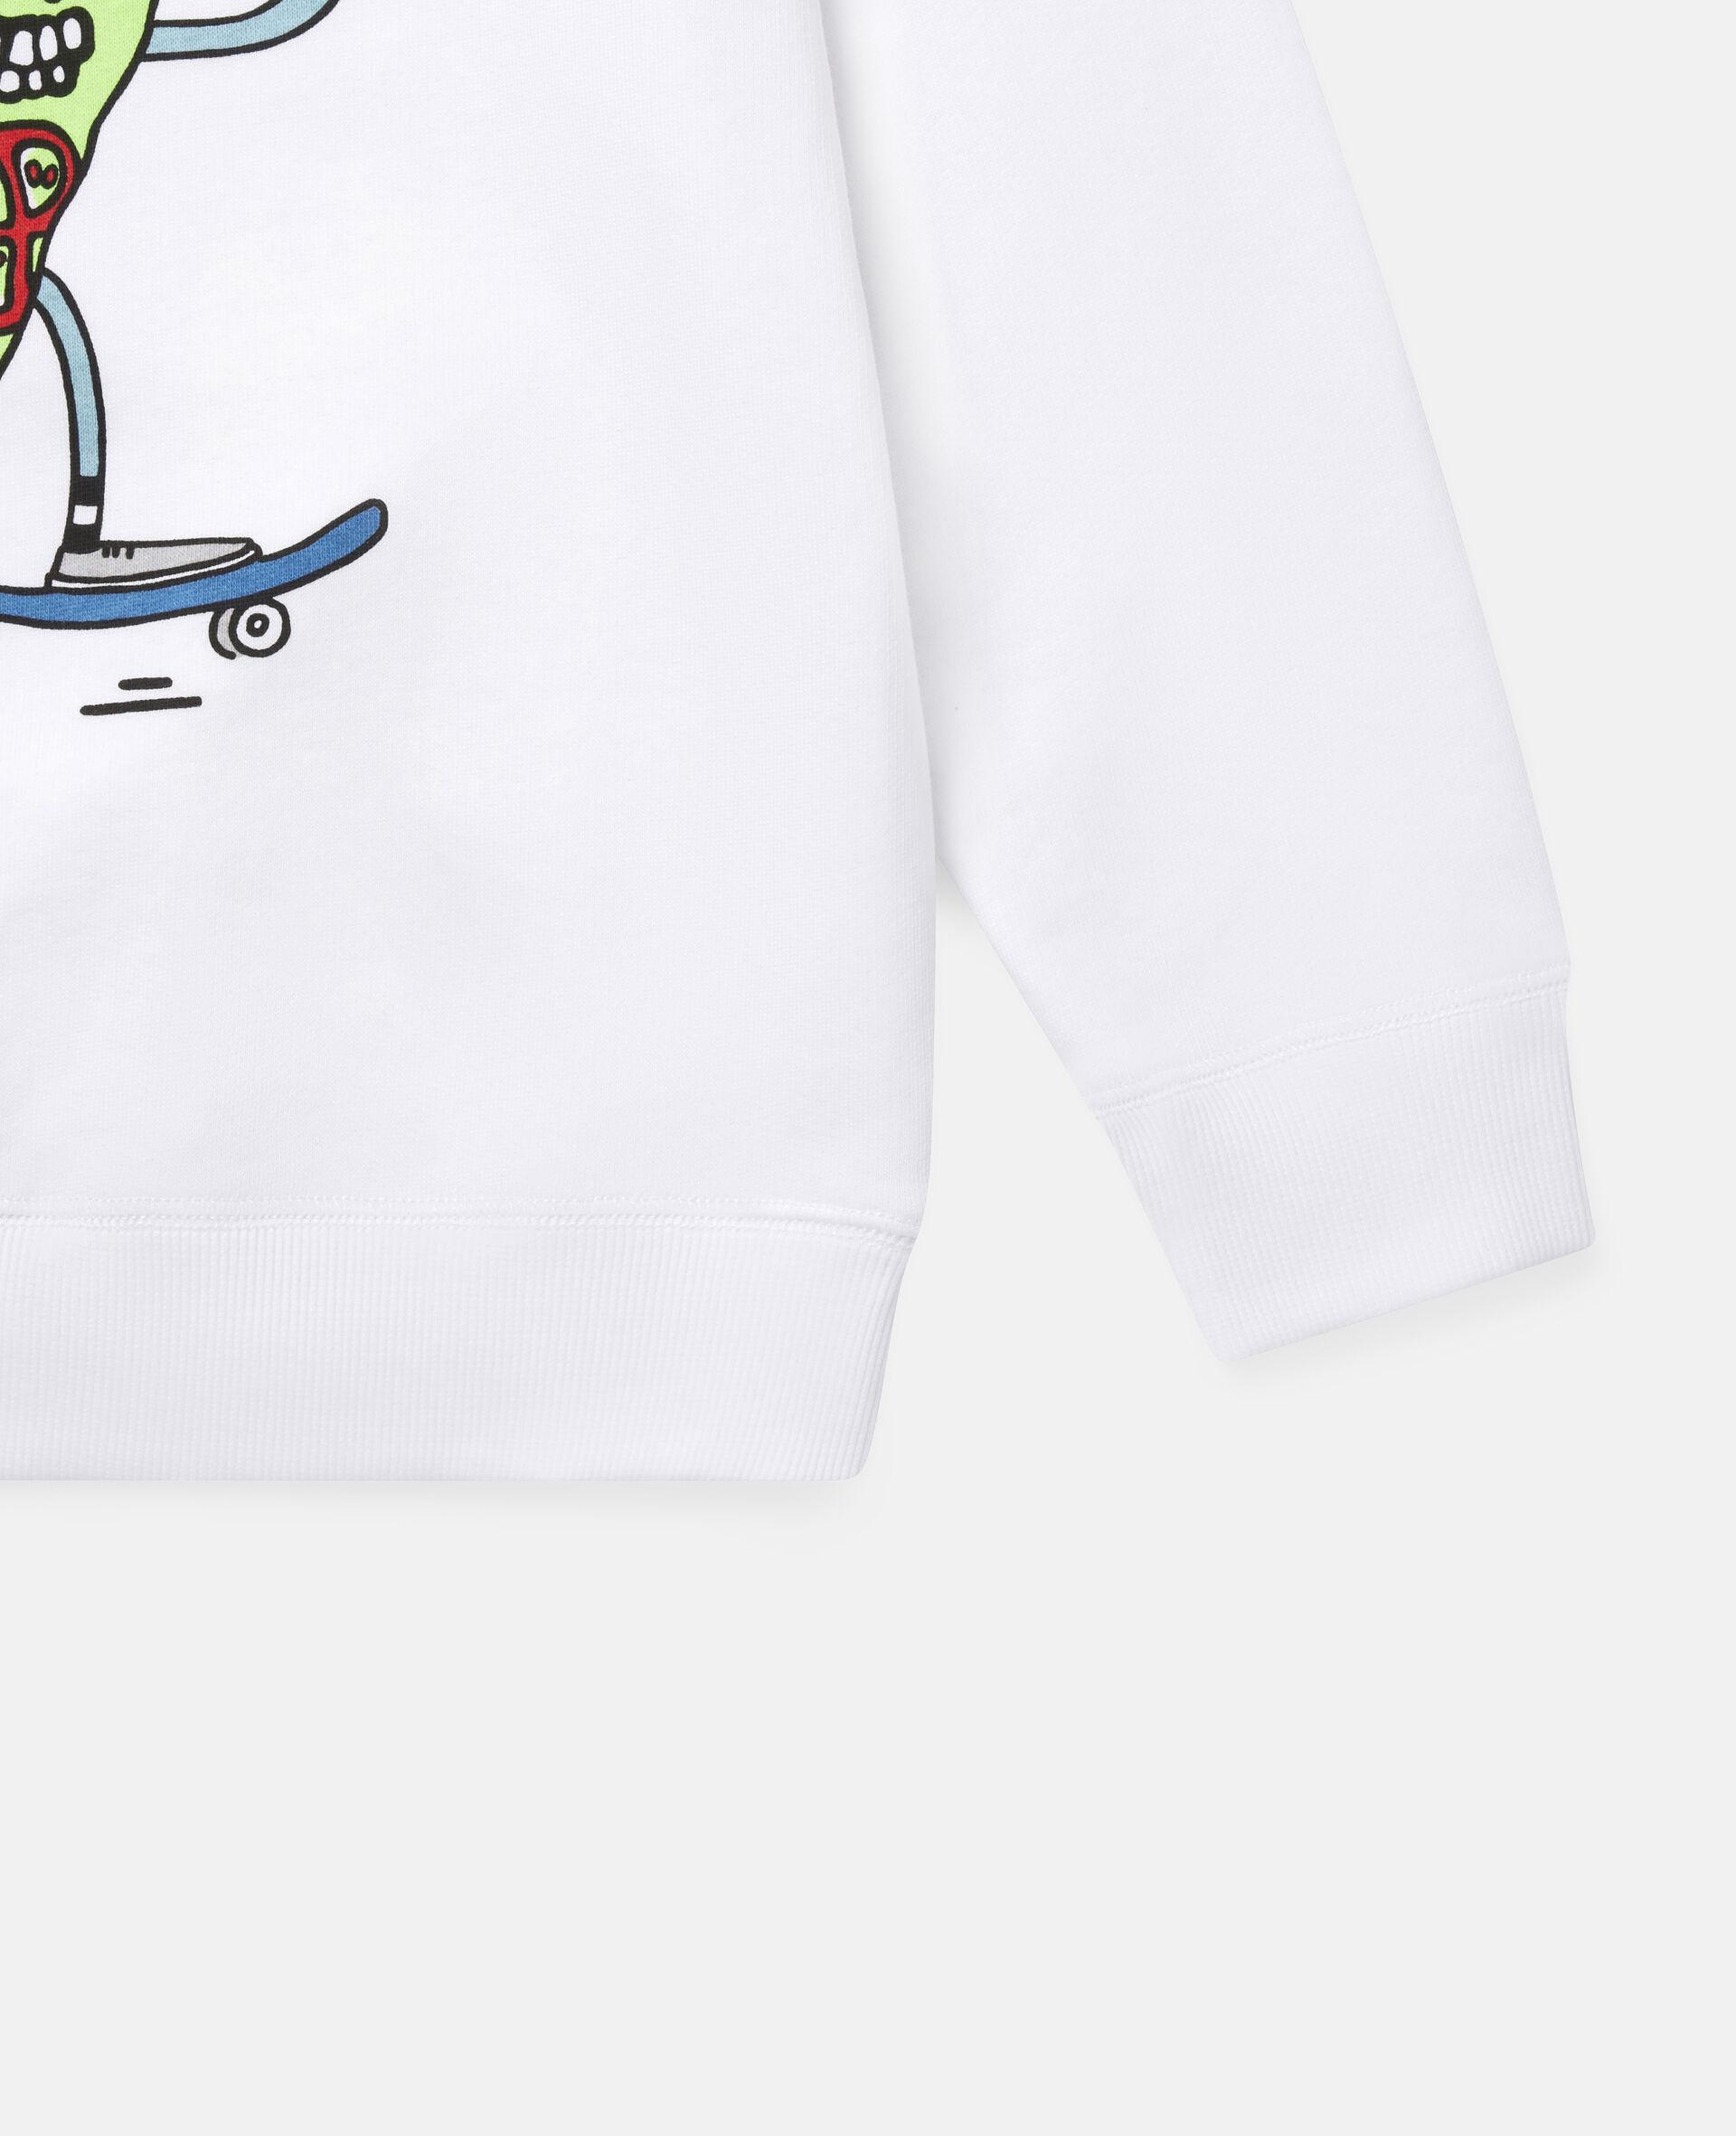 Pizza Skater Fleece Sweatshirt-White-large image number 2